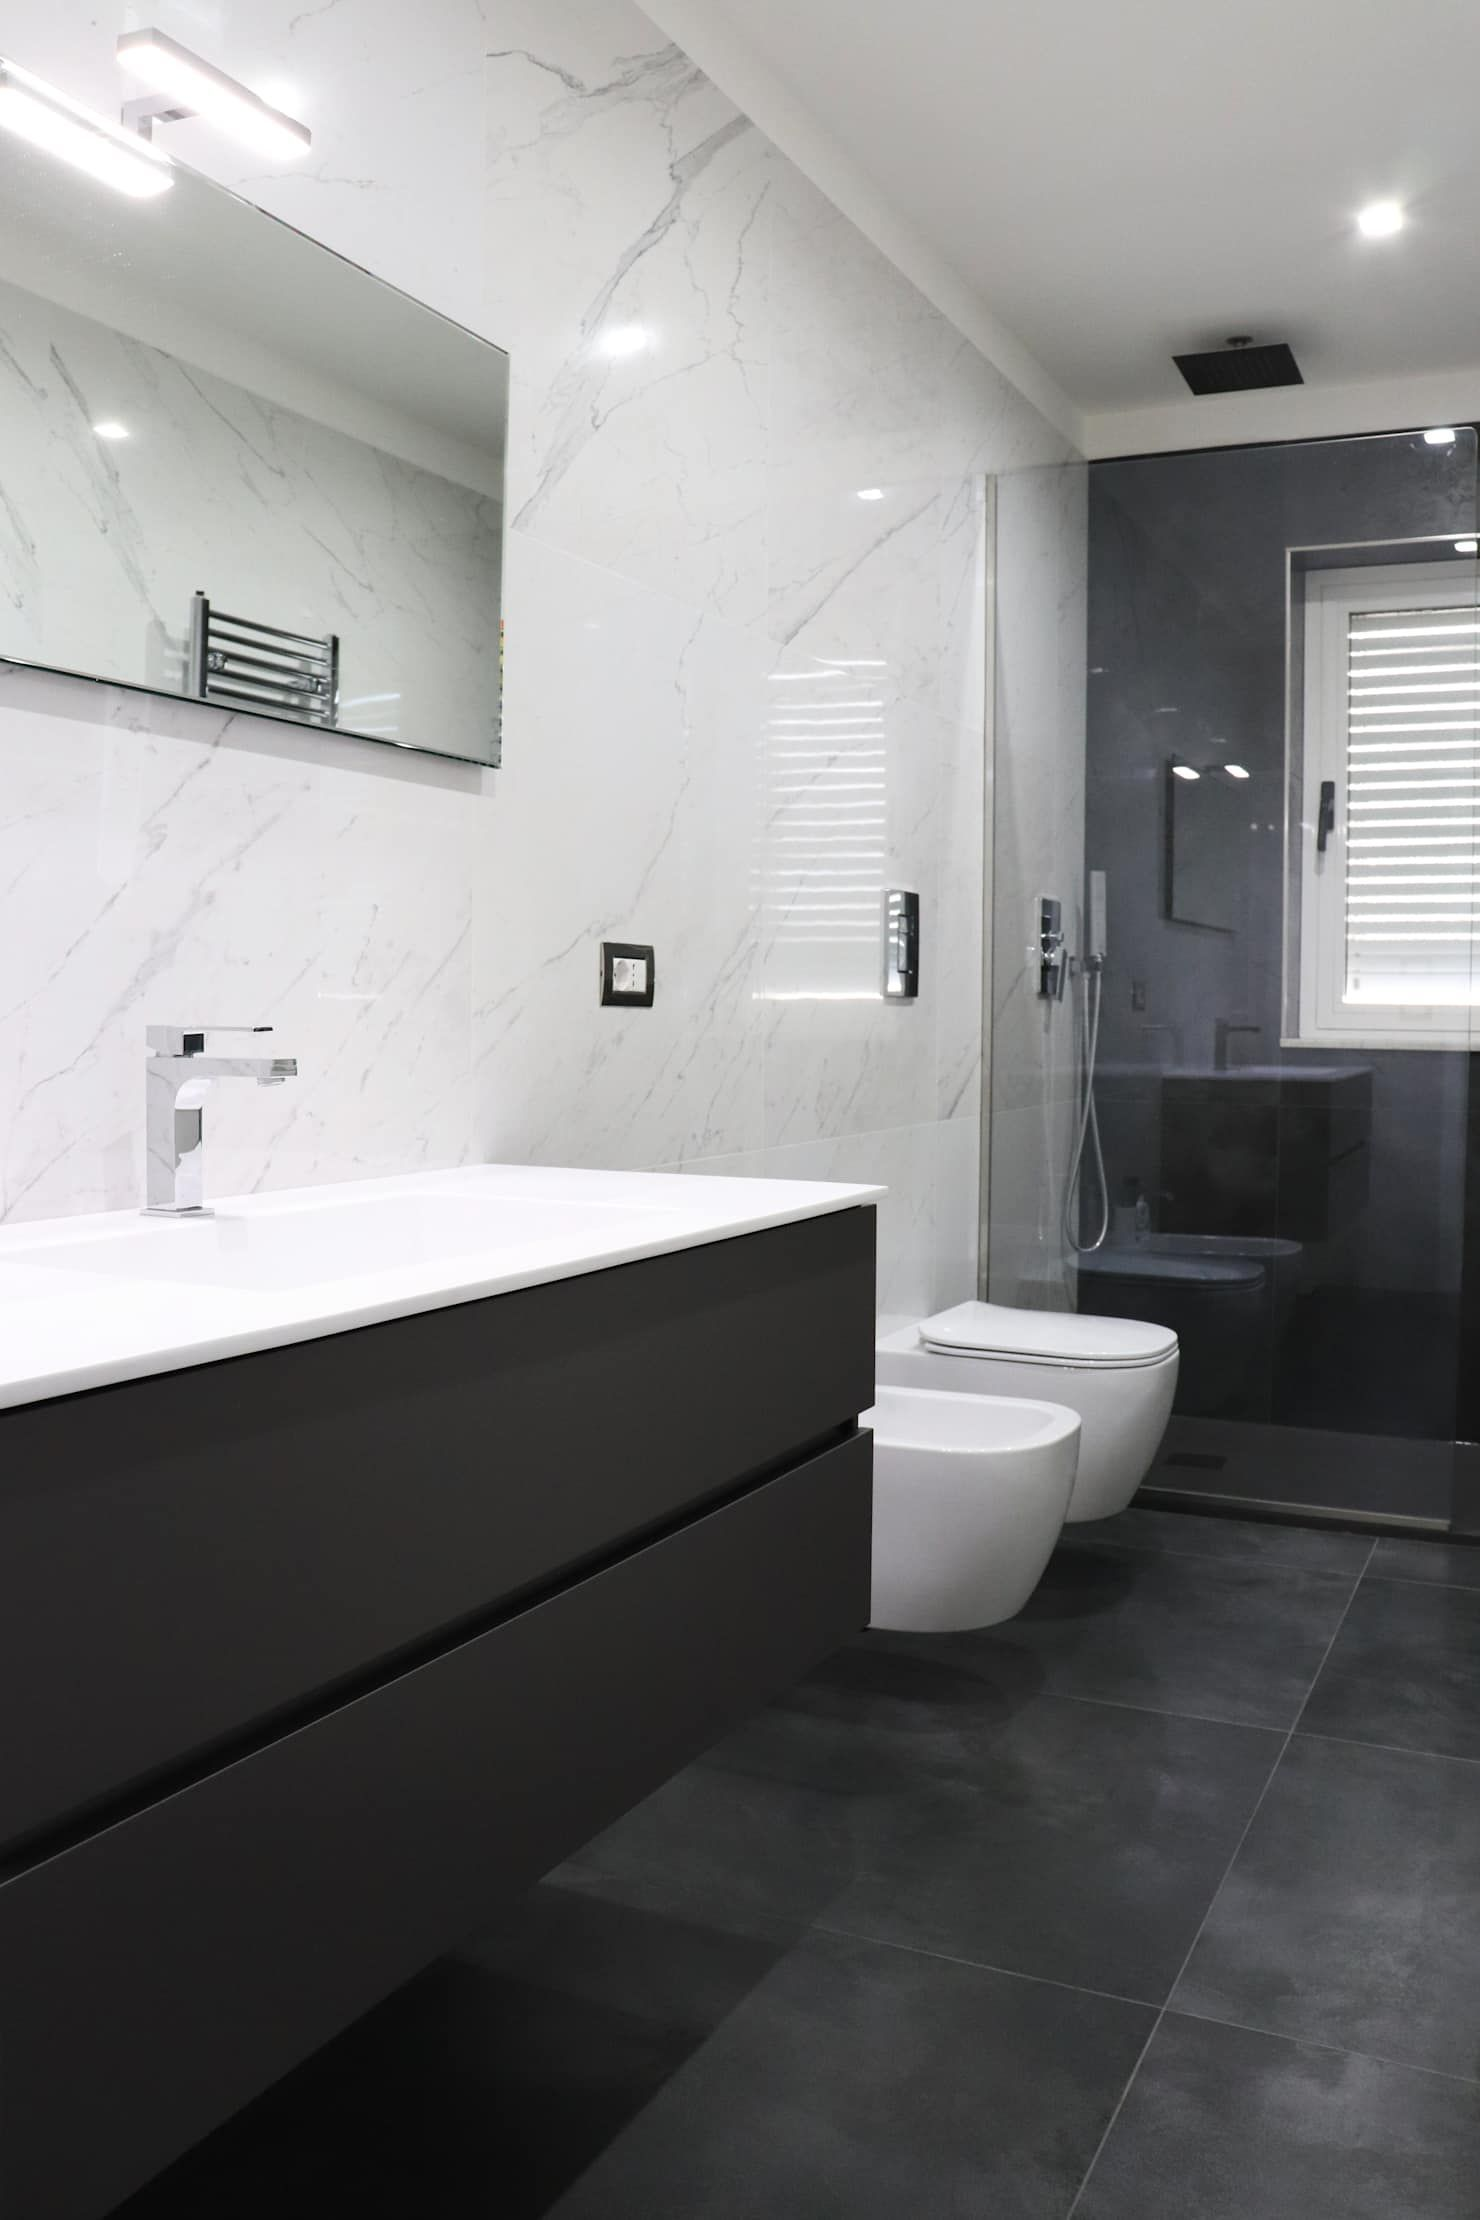 New Home Decor Design Interestinginformations Com In 2020 Badezimmer Innenausstattung Badezimmer Badezimmer Umbau